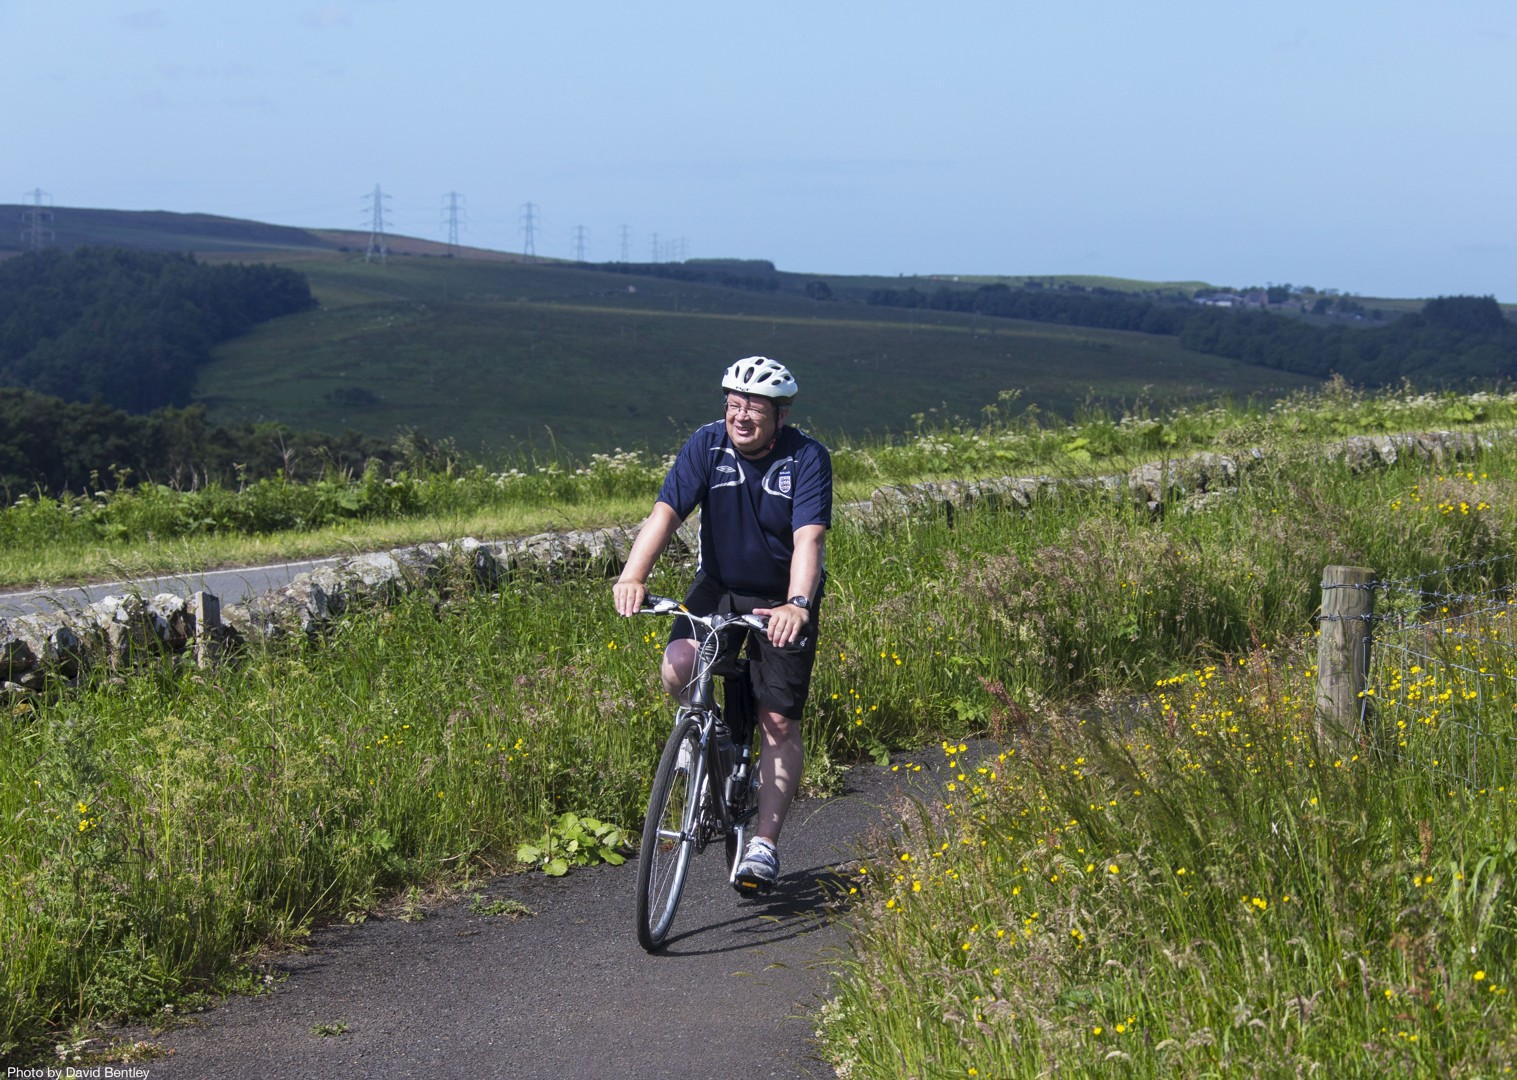 Self-Guided-Leisure-Cycling-Holiday-Hadrians-Cycleway-UK-forts-of-Birdoswald-Vindolanda.jpg - UK - Hadrian's Cycleway - 2 Days Cycling - Self-Guided Leisure Cycling Holiday - Leisure Cycling